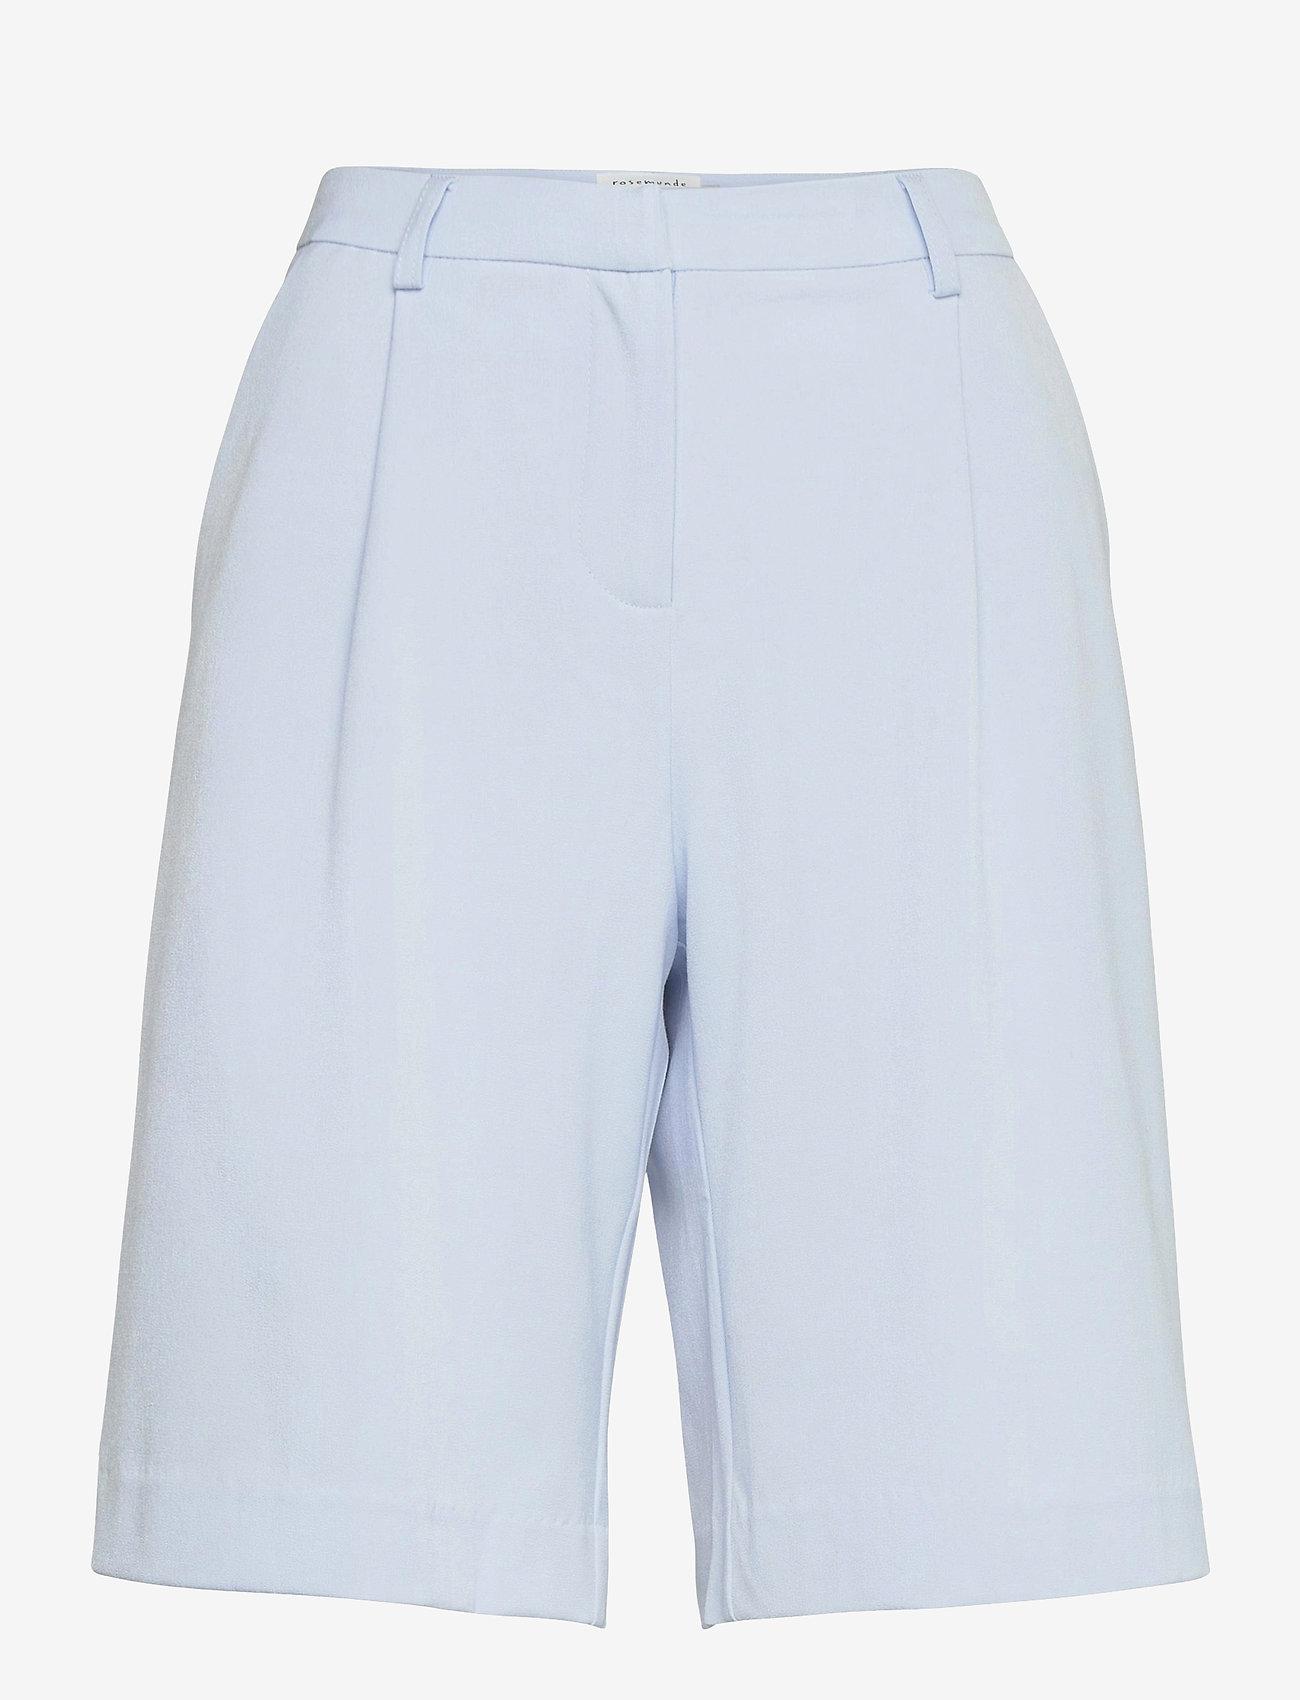 Rosemunde - Shorts - short chino - heather sky - 1